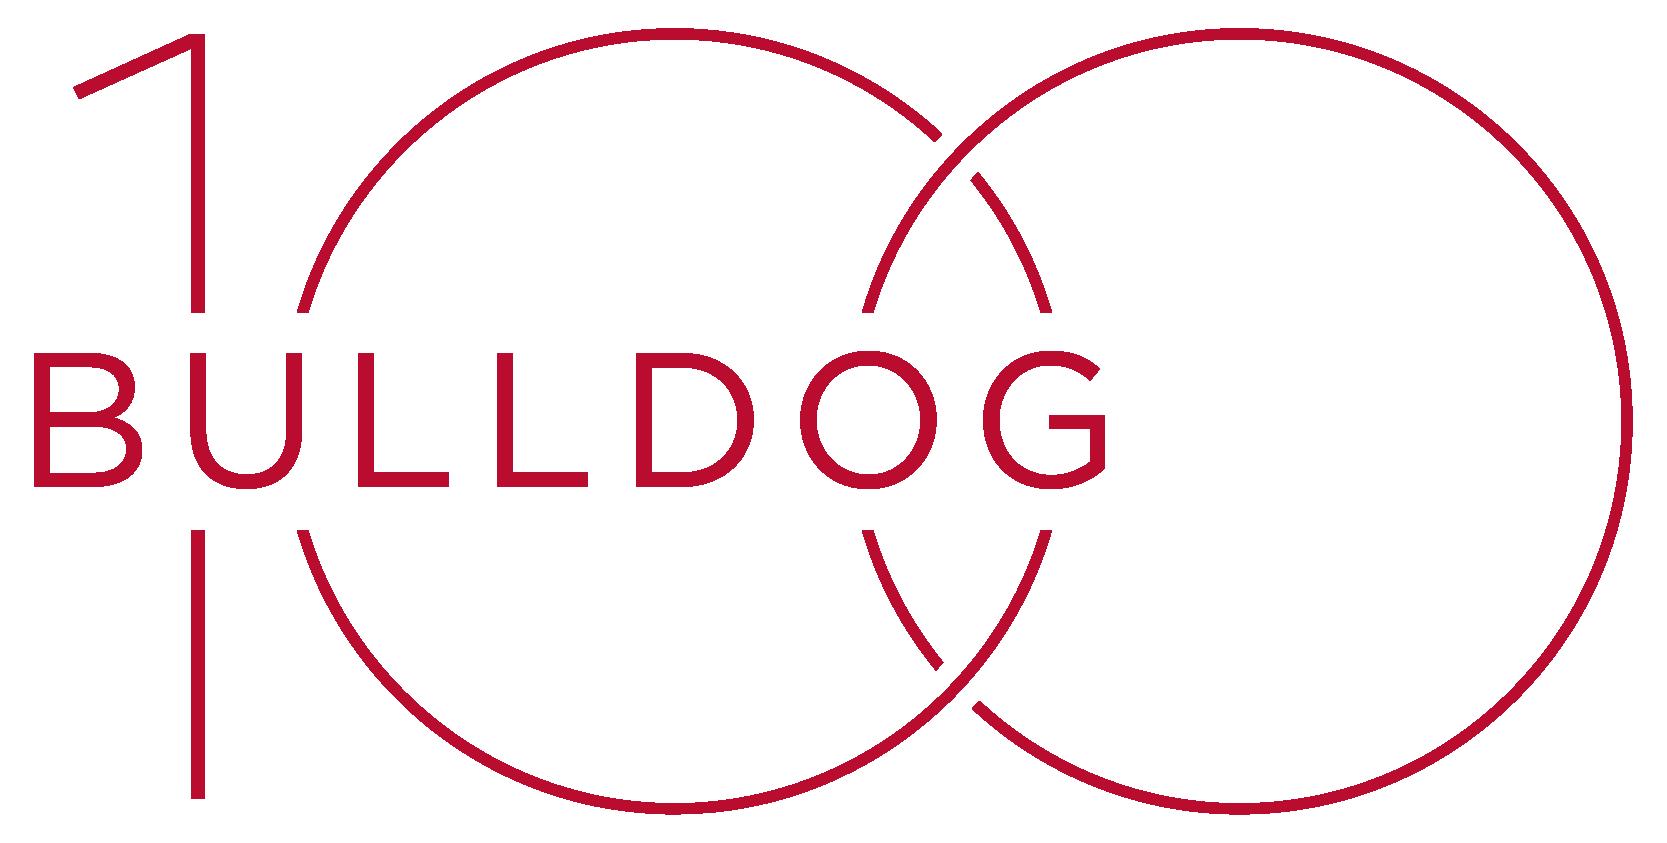 Bulldog 100 red